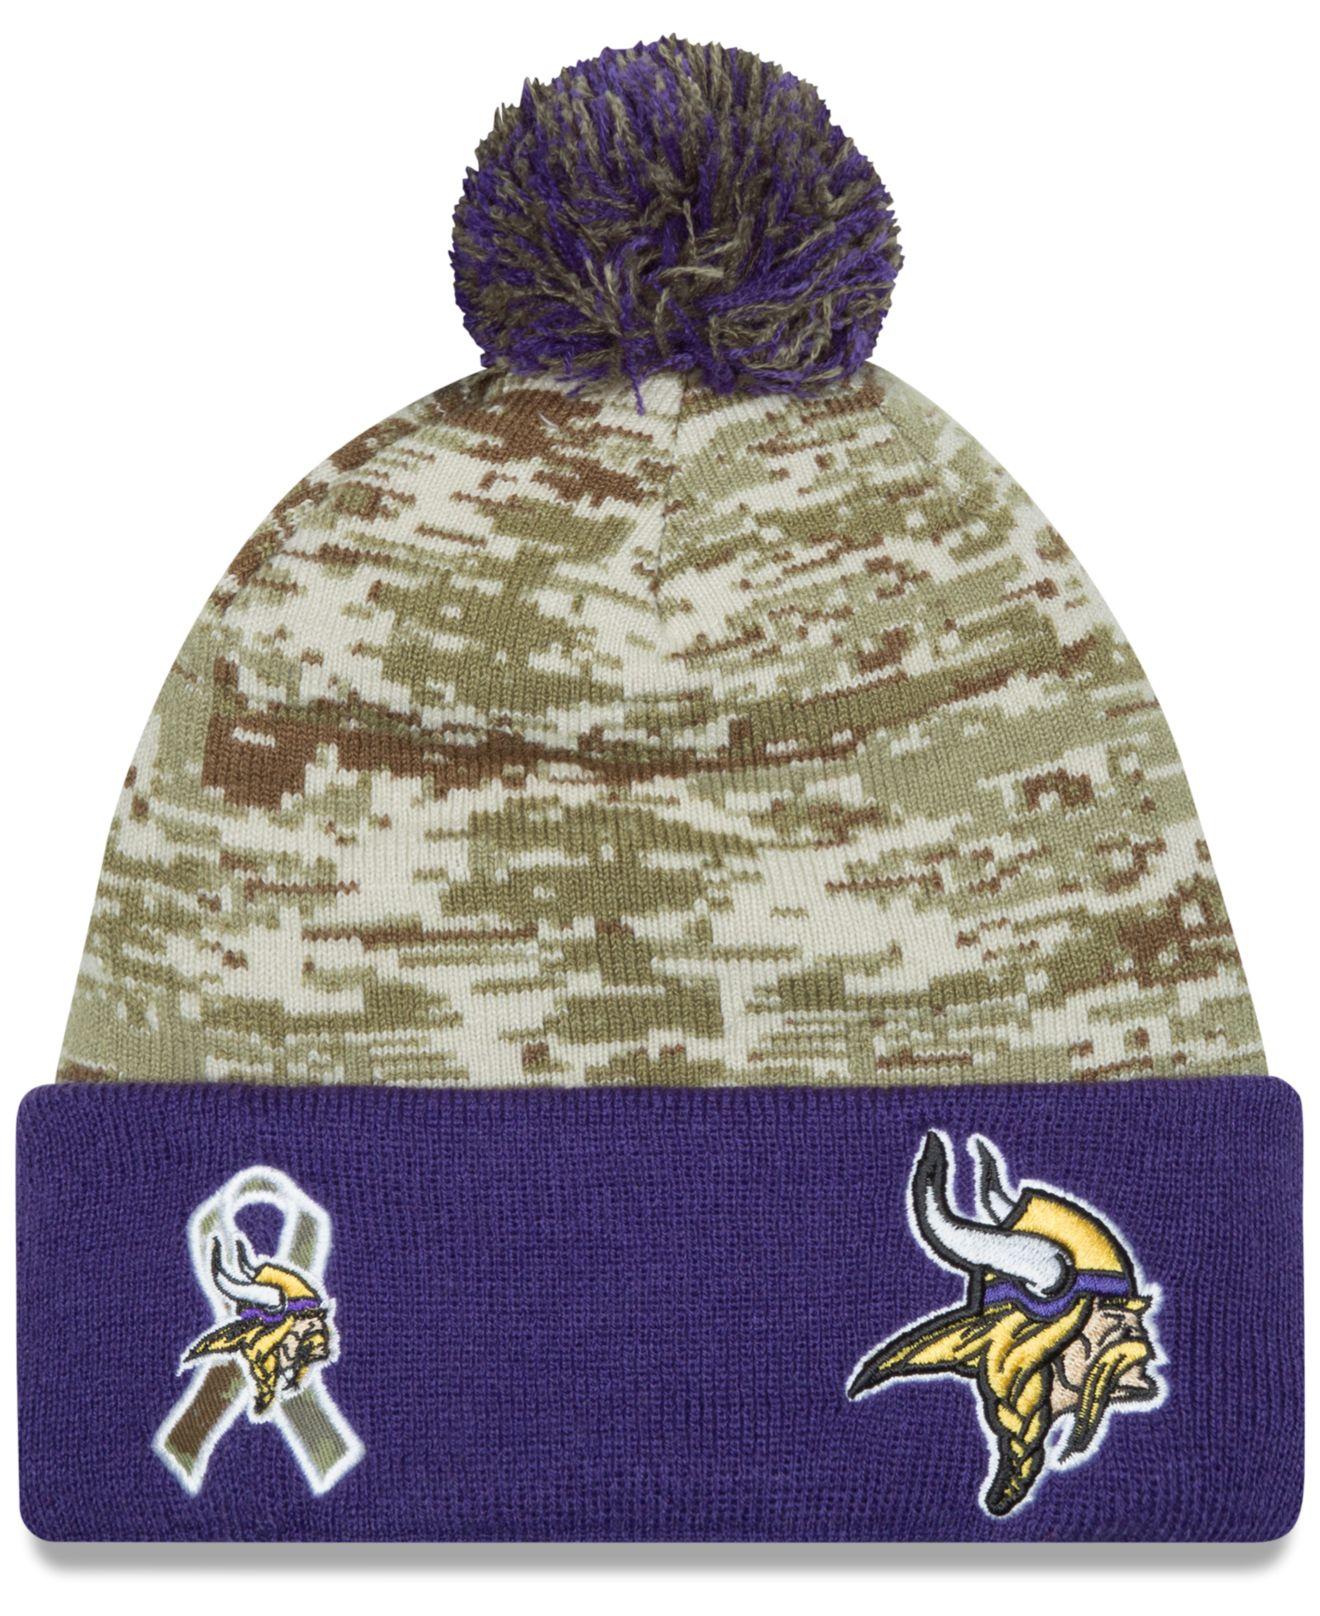 746f6f1fe KTZ Minnesota Vikings Salute To Service Knit Hat in Green for Men - Lyst